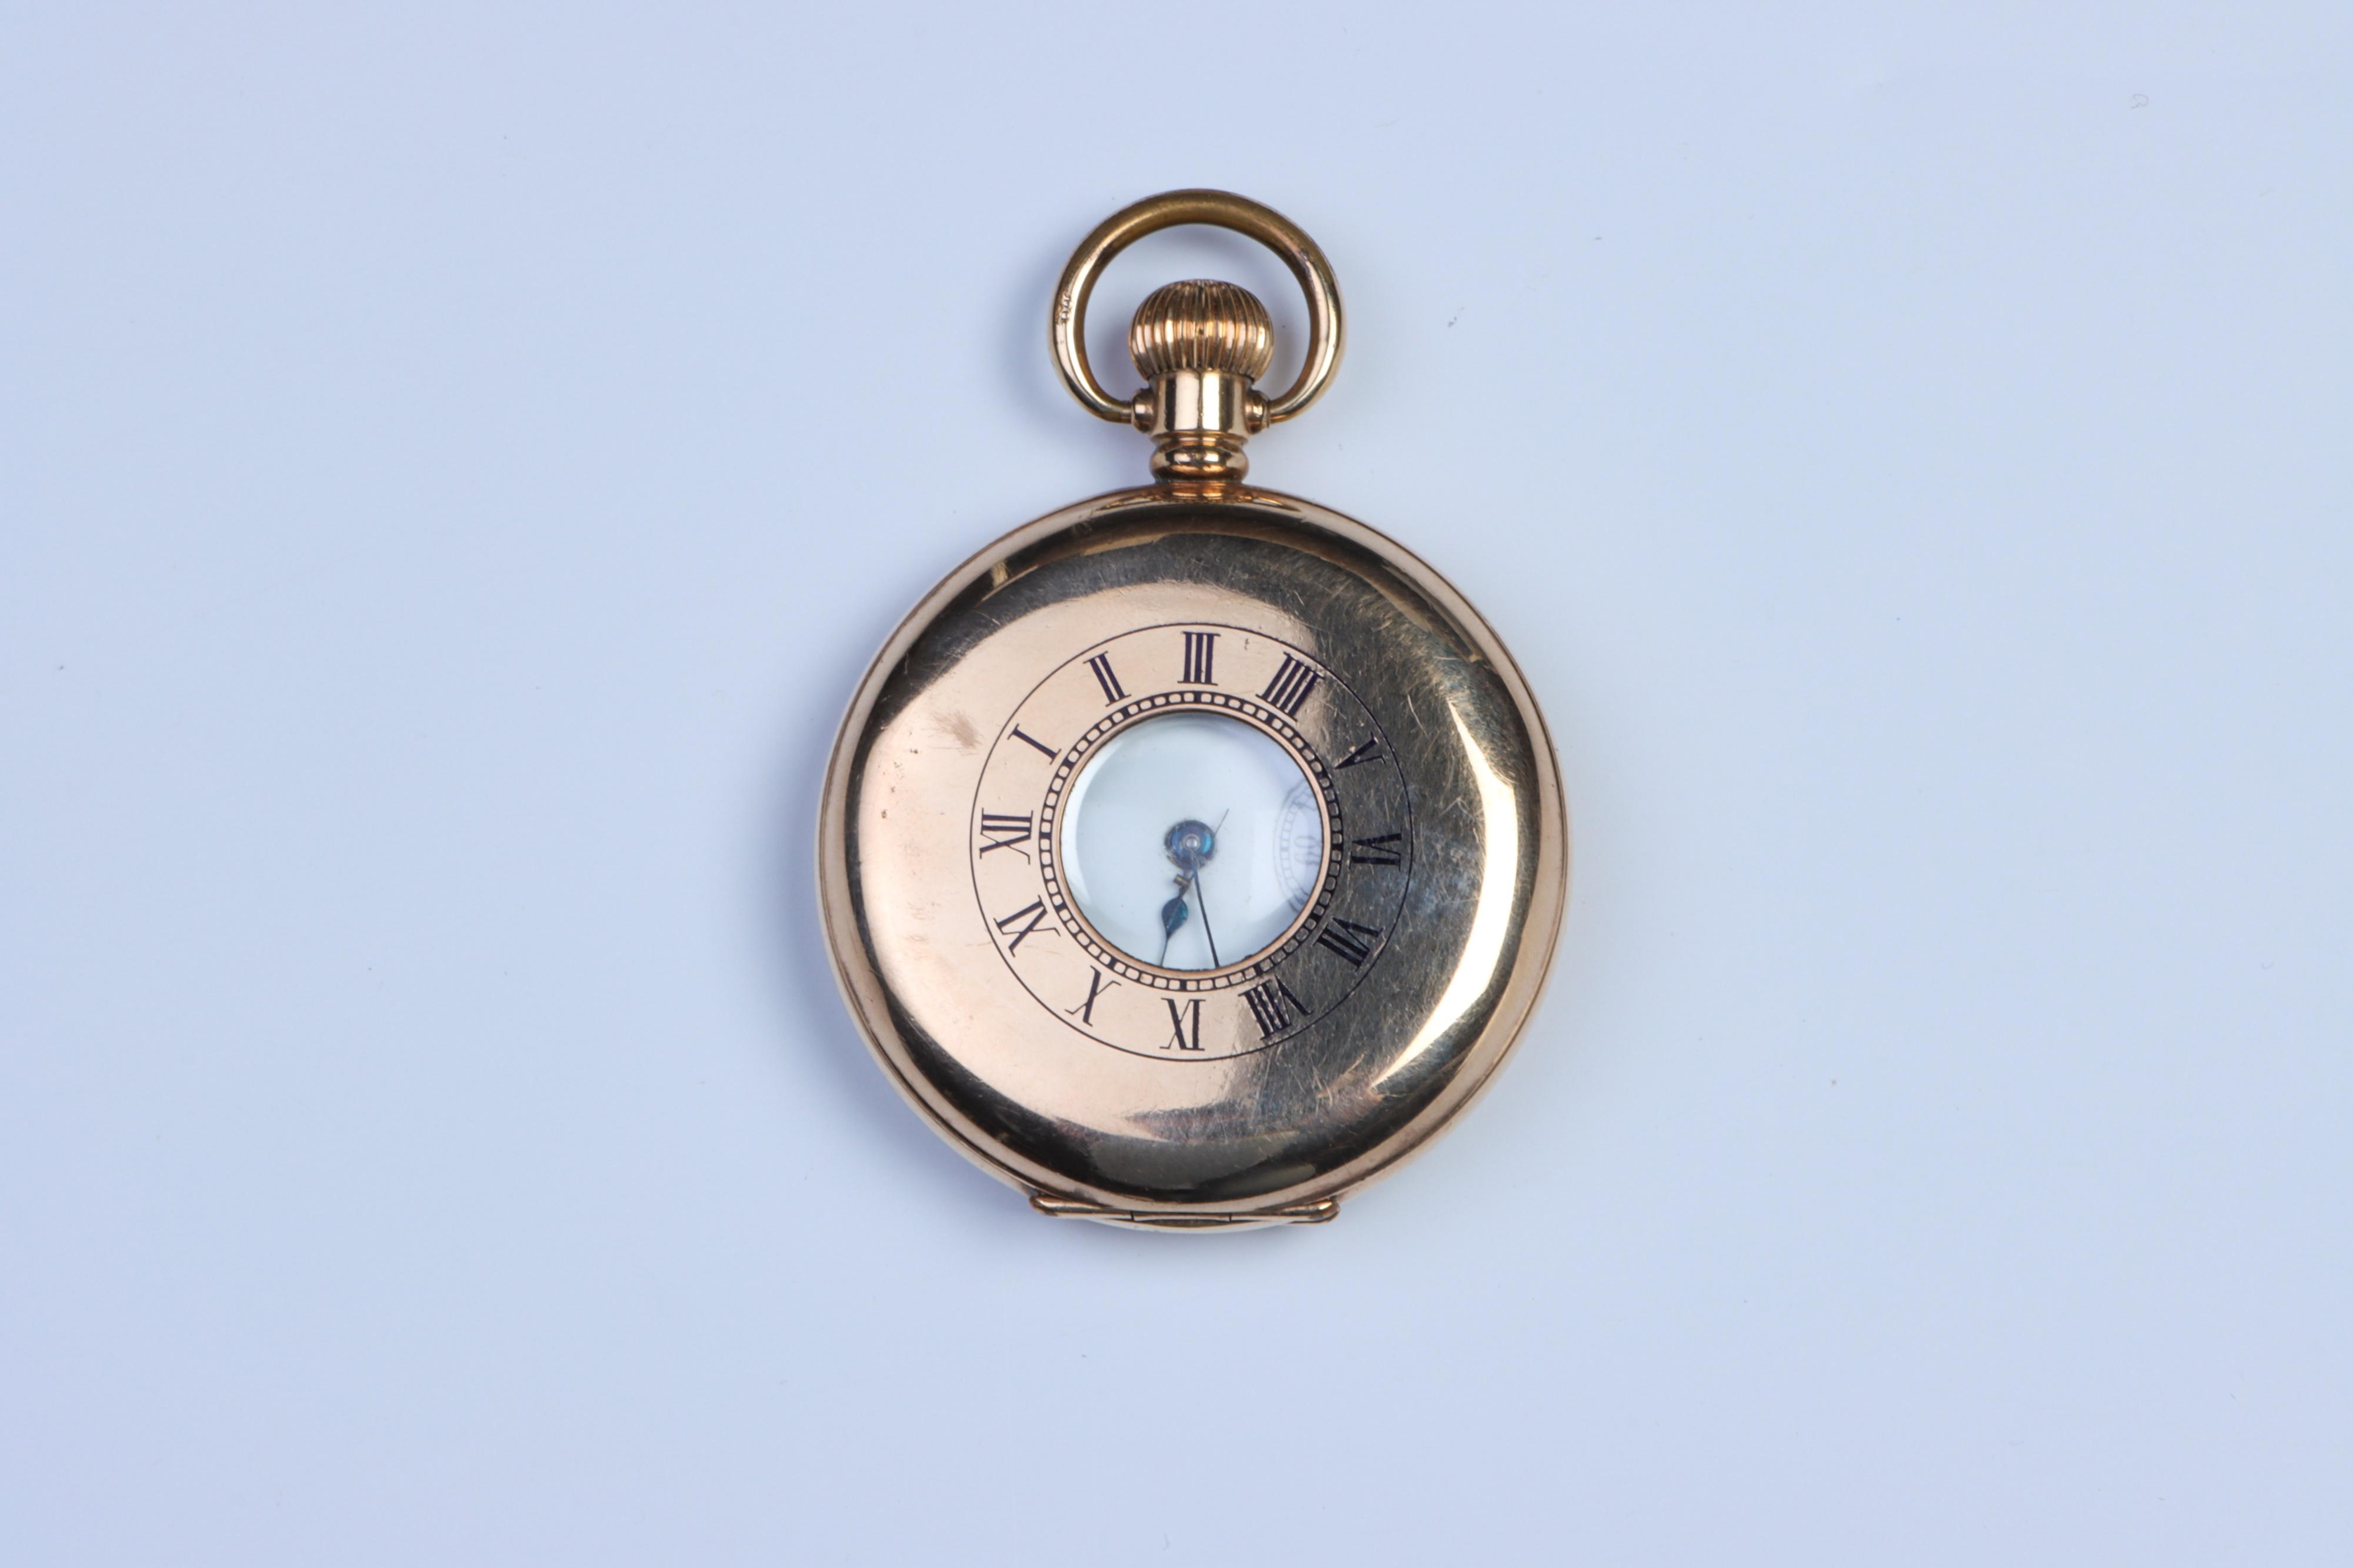 A Waltham Half-Hunter Pocket Watch, - Image 2 of 3